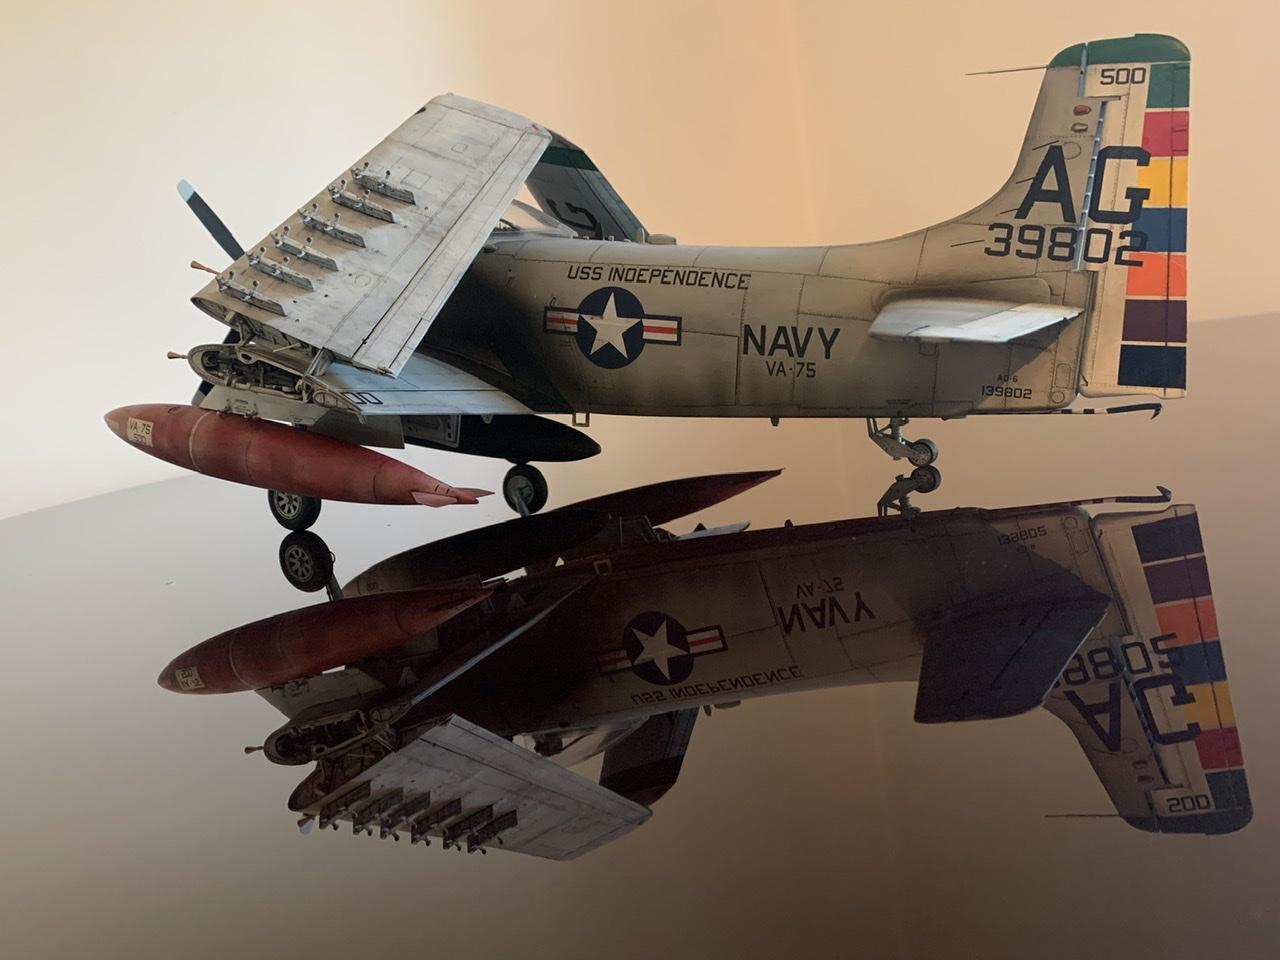 EAAF19FE-53B8-4742-A93F-9F6E6D6CB7C8.jpeg